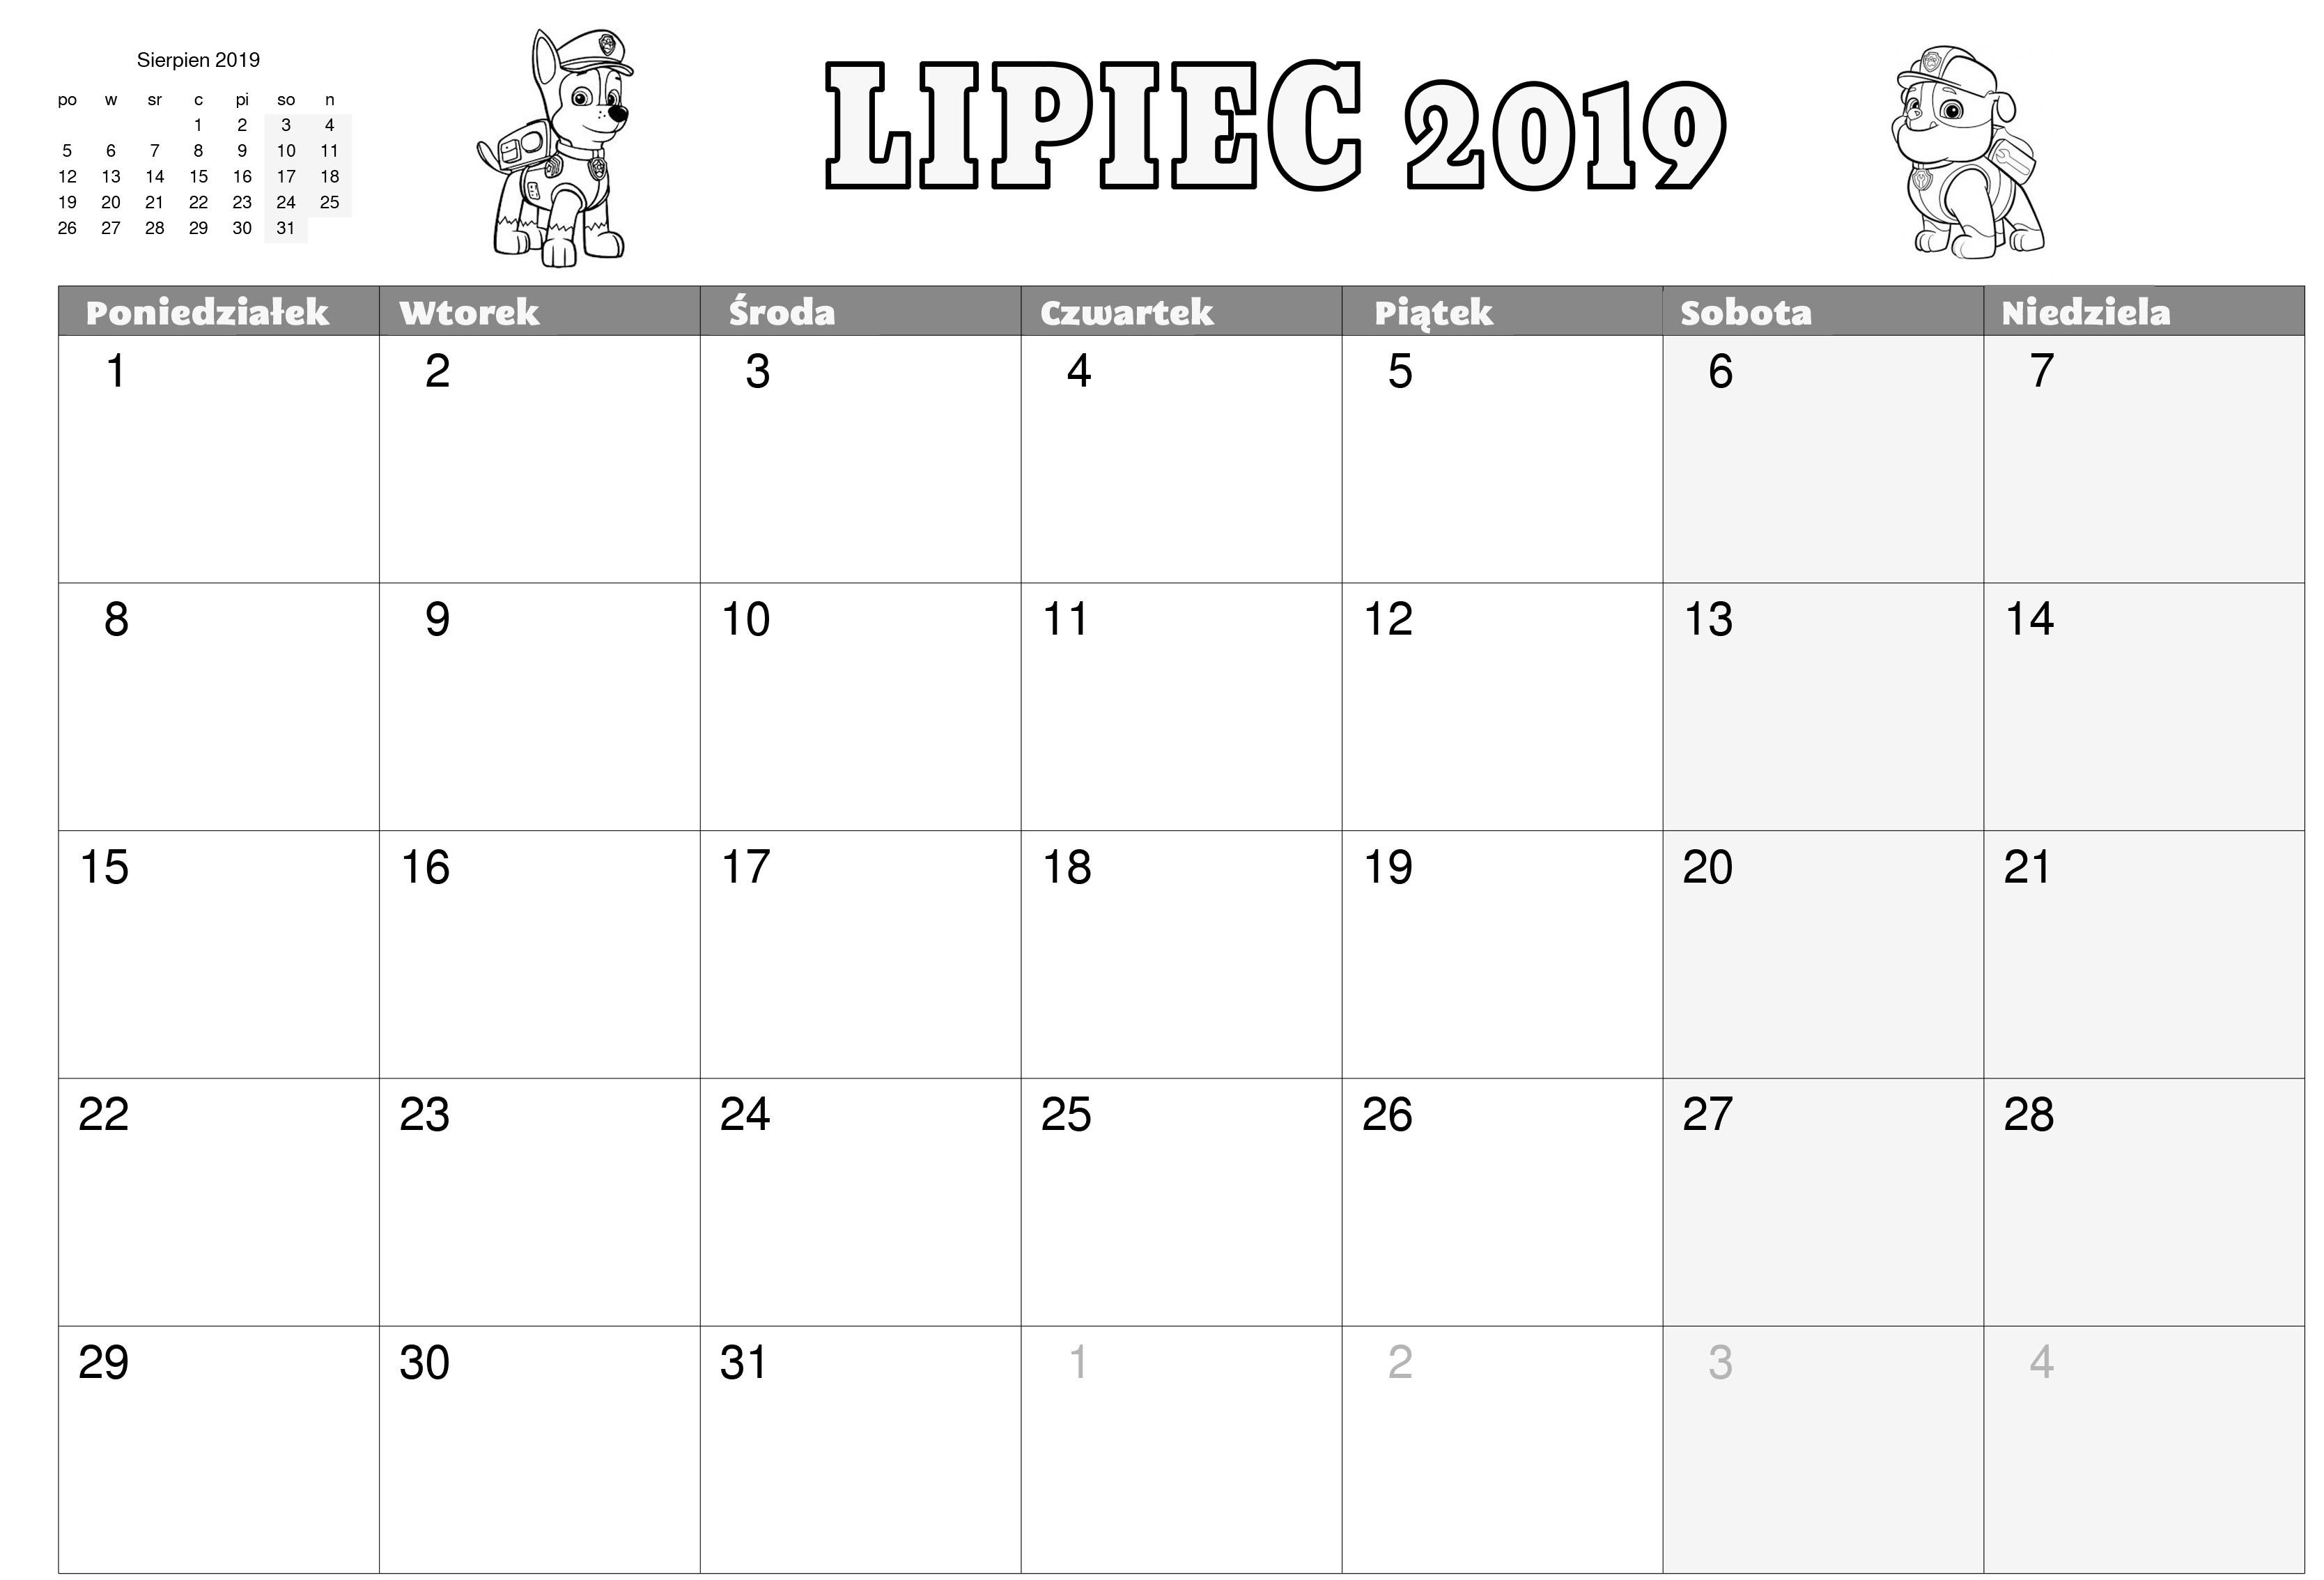 Kalendarz Psi Patrol do wydruku - Lipiec 2019